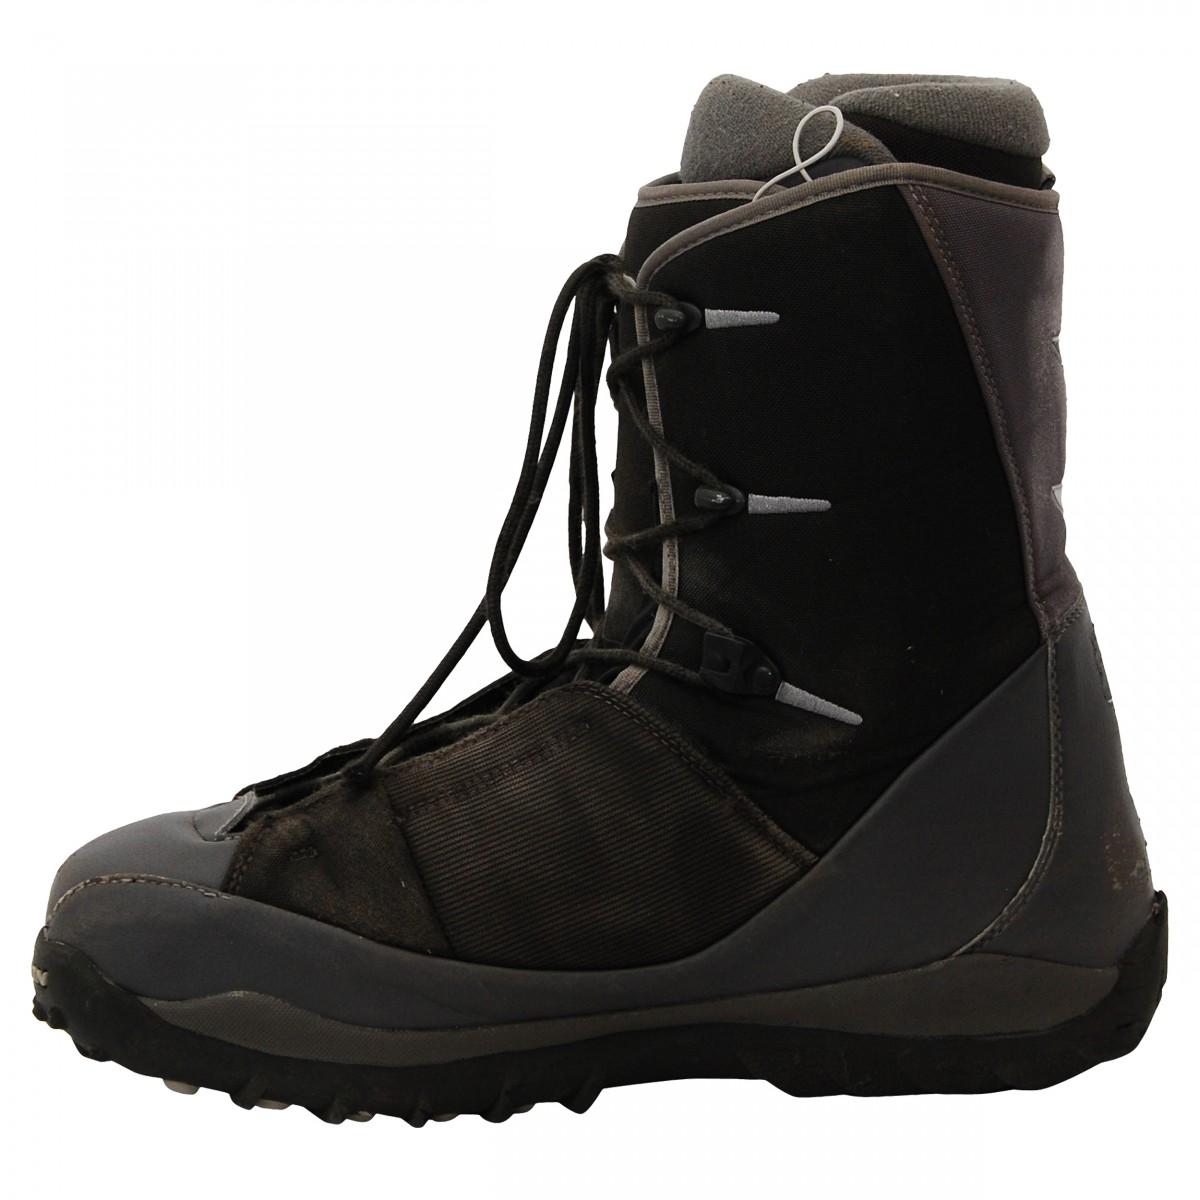 Boots de snowboard Salomon Symbio